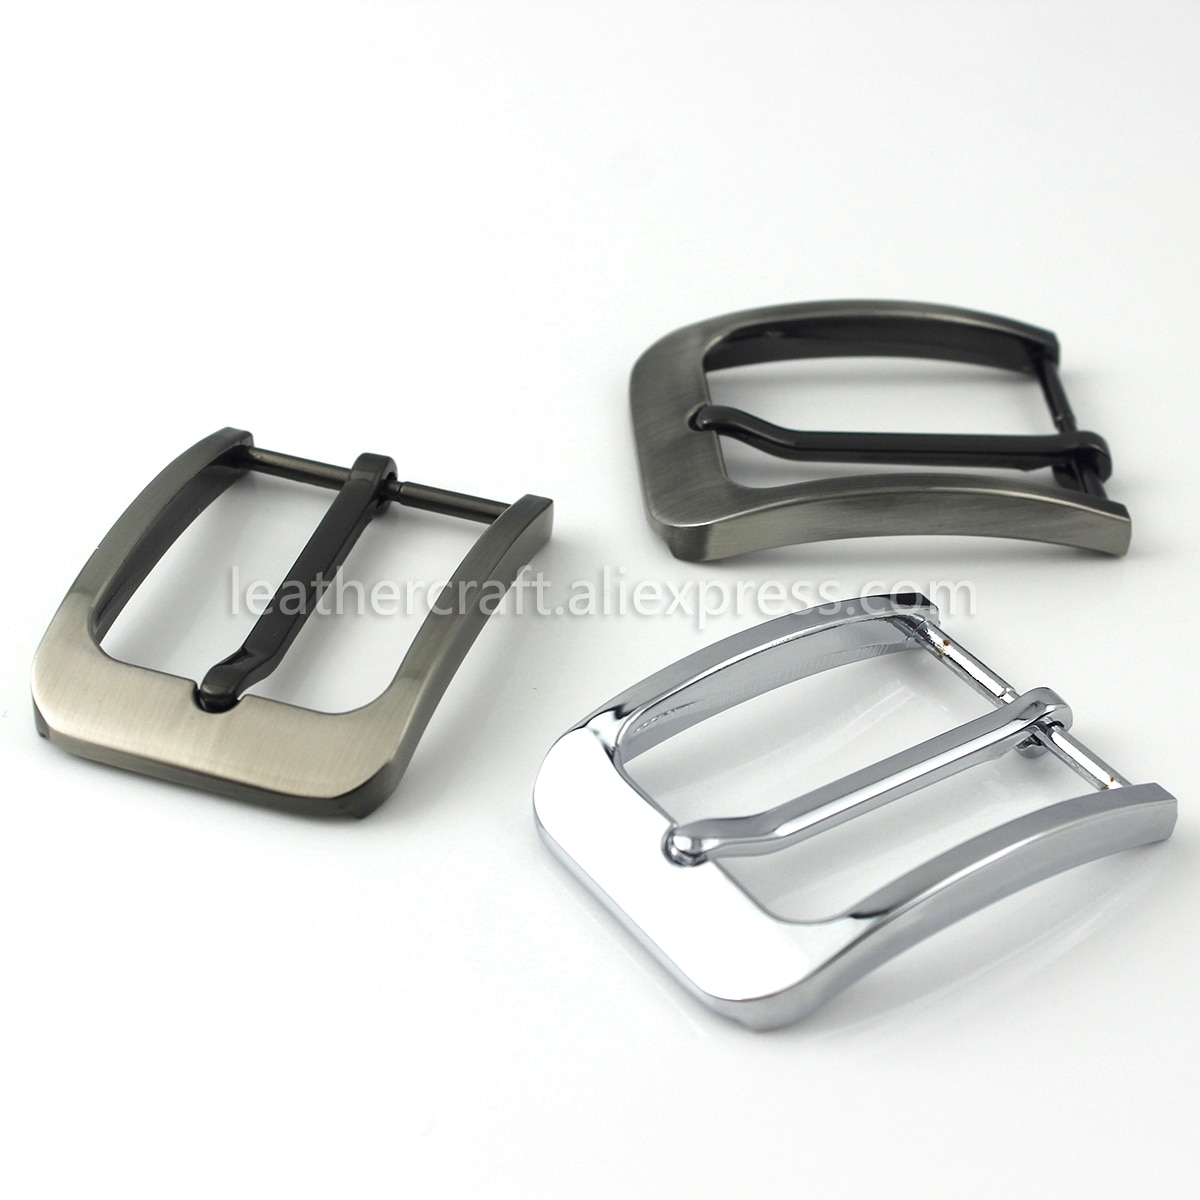 1pcs Men Belt Buckle 35mm Metal Pin Buckle Fashion Jeans Waistband Buckles For 33mm-34cm Belt DIY Le